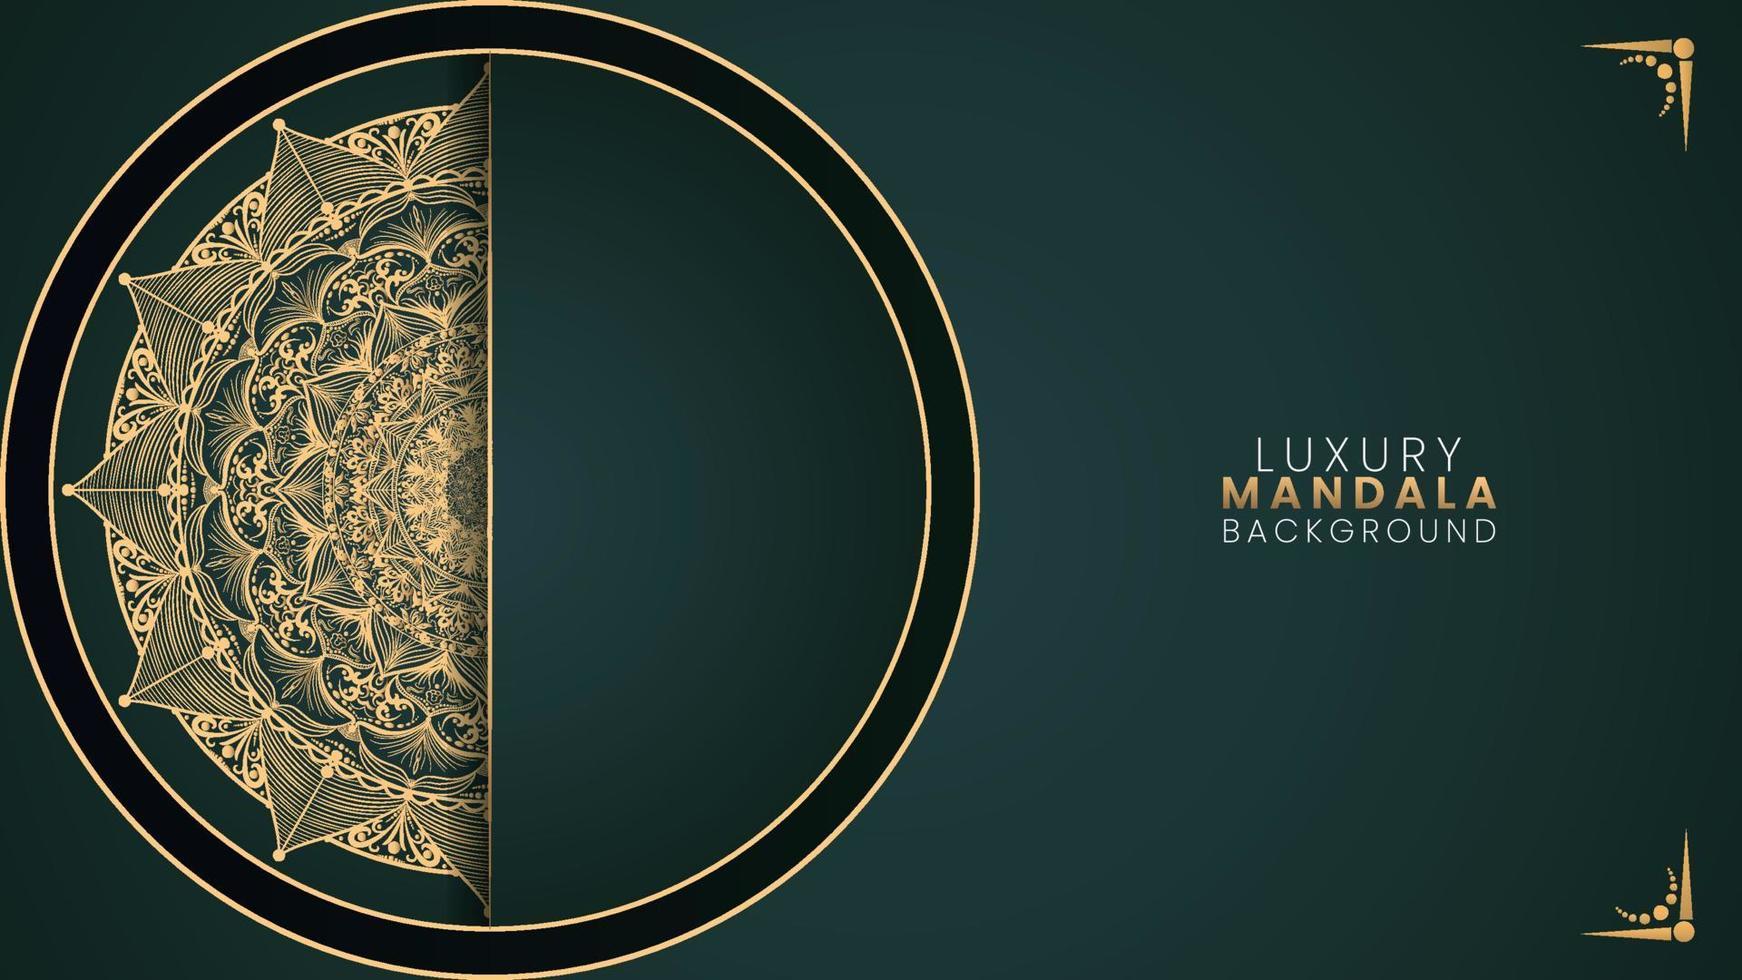 fundo islâmico estilo arabescos dourados vetor